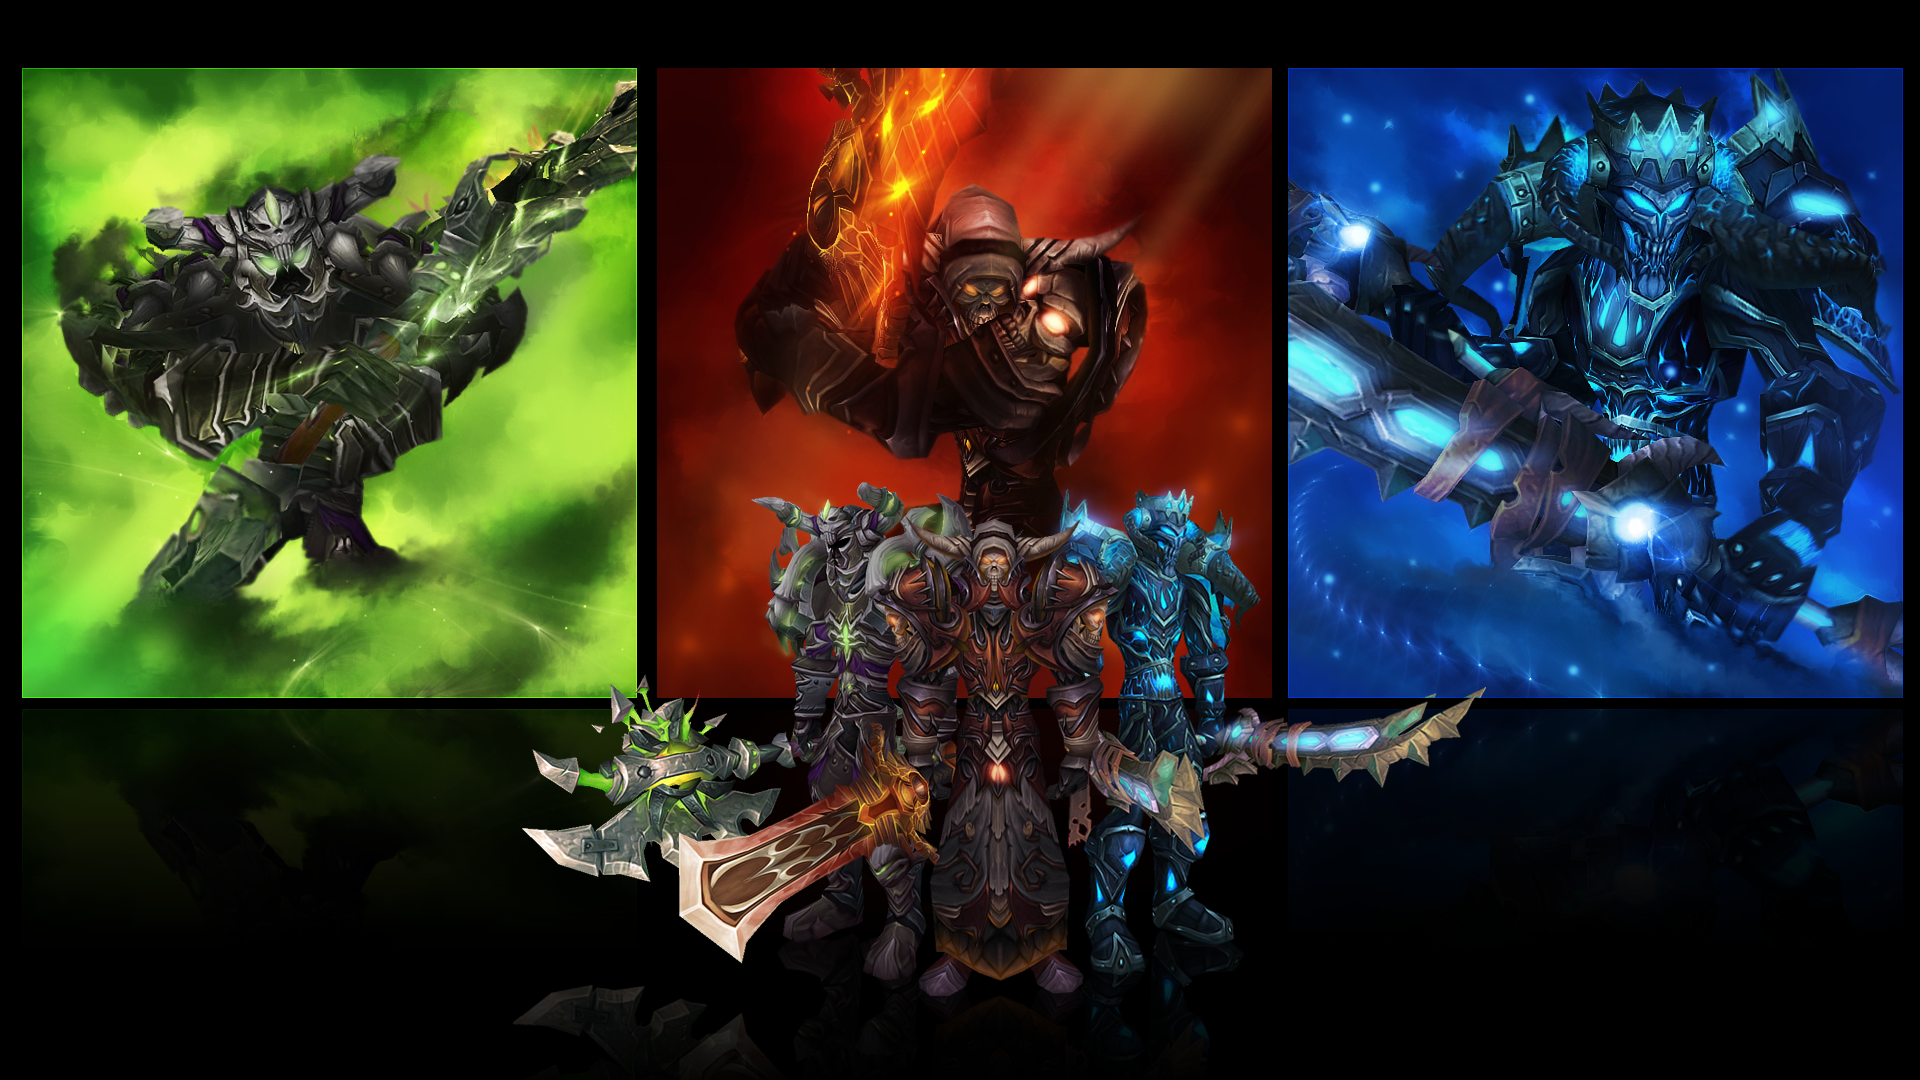 Death Knight Wallpaper By Thunderspeed On Deviantart